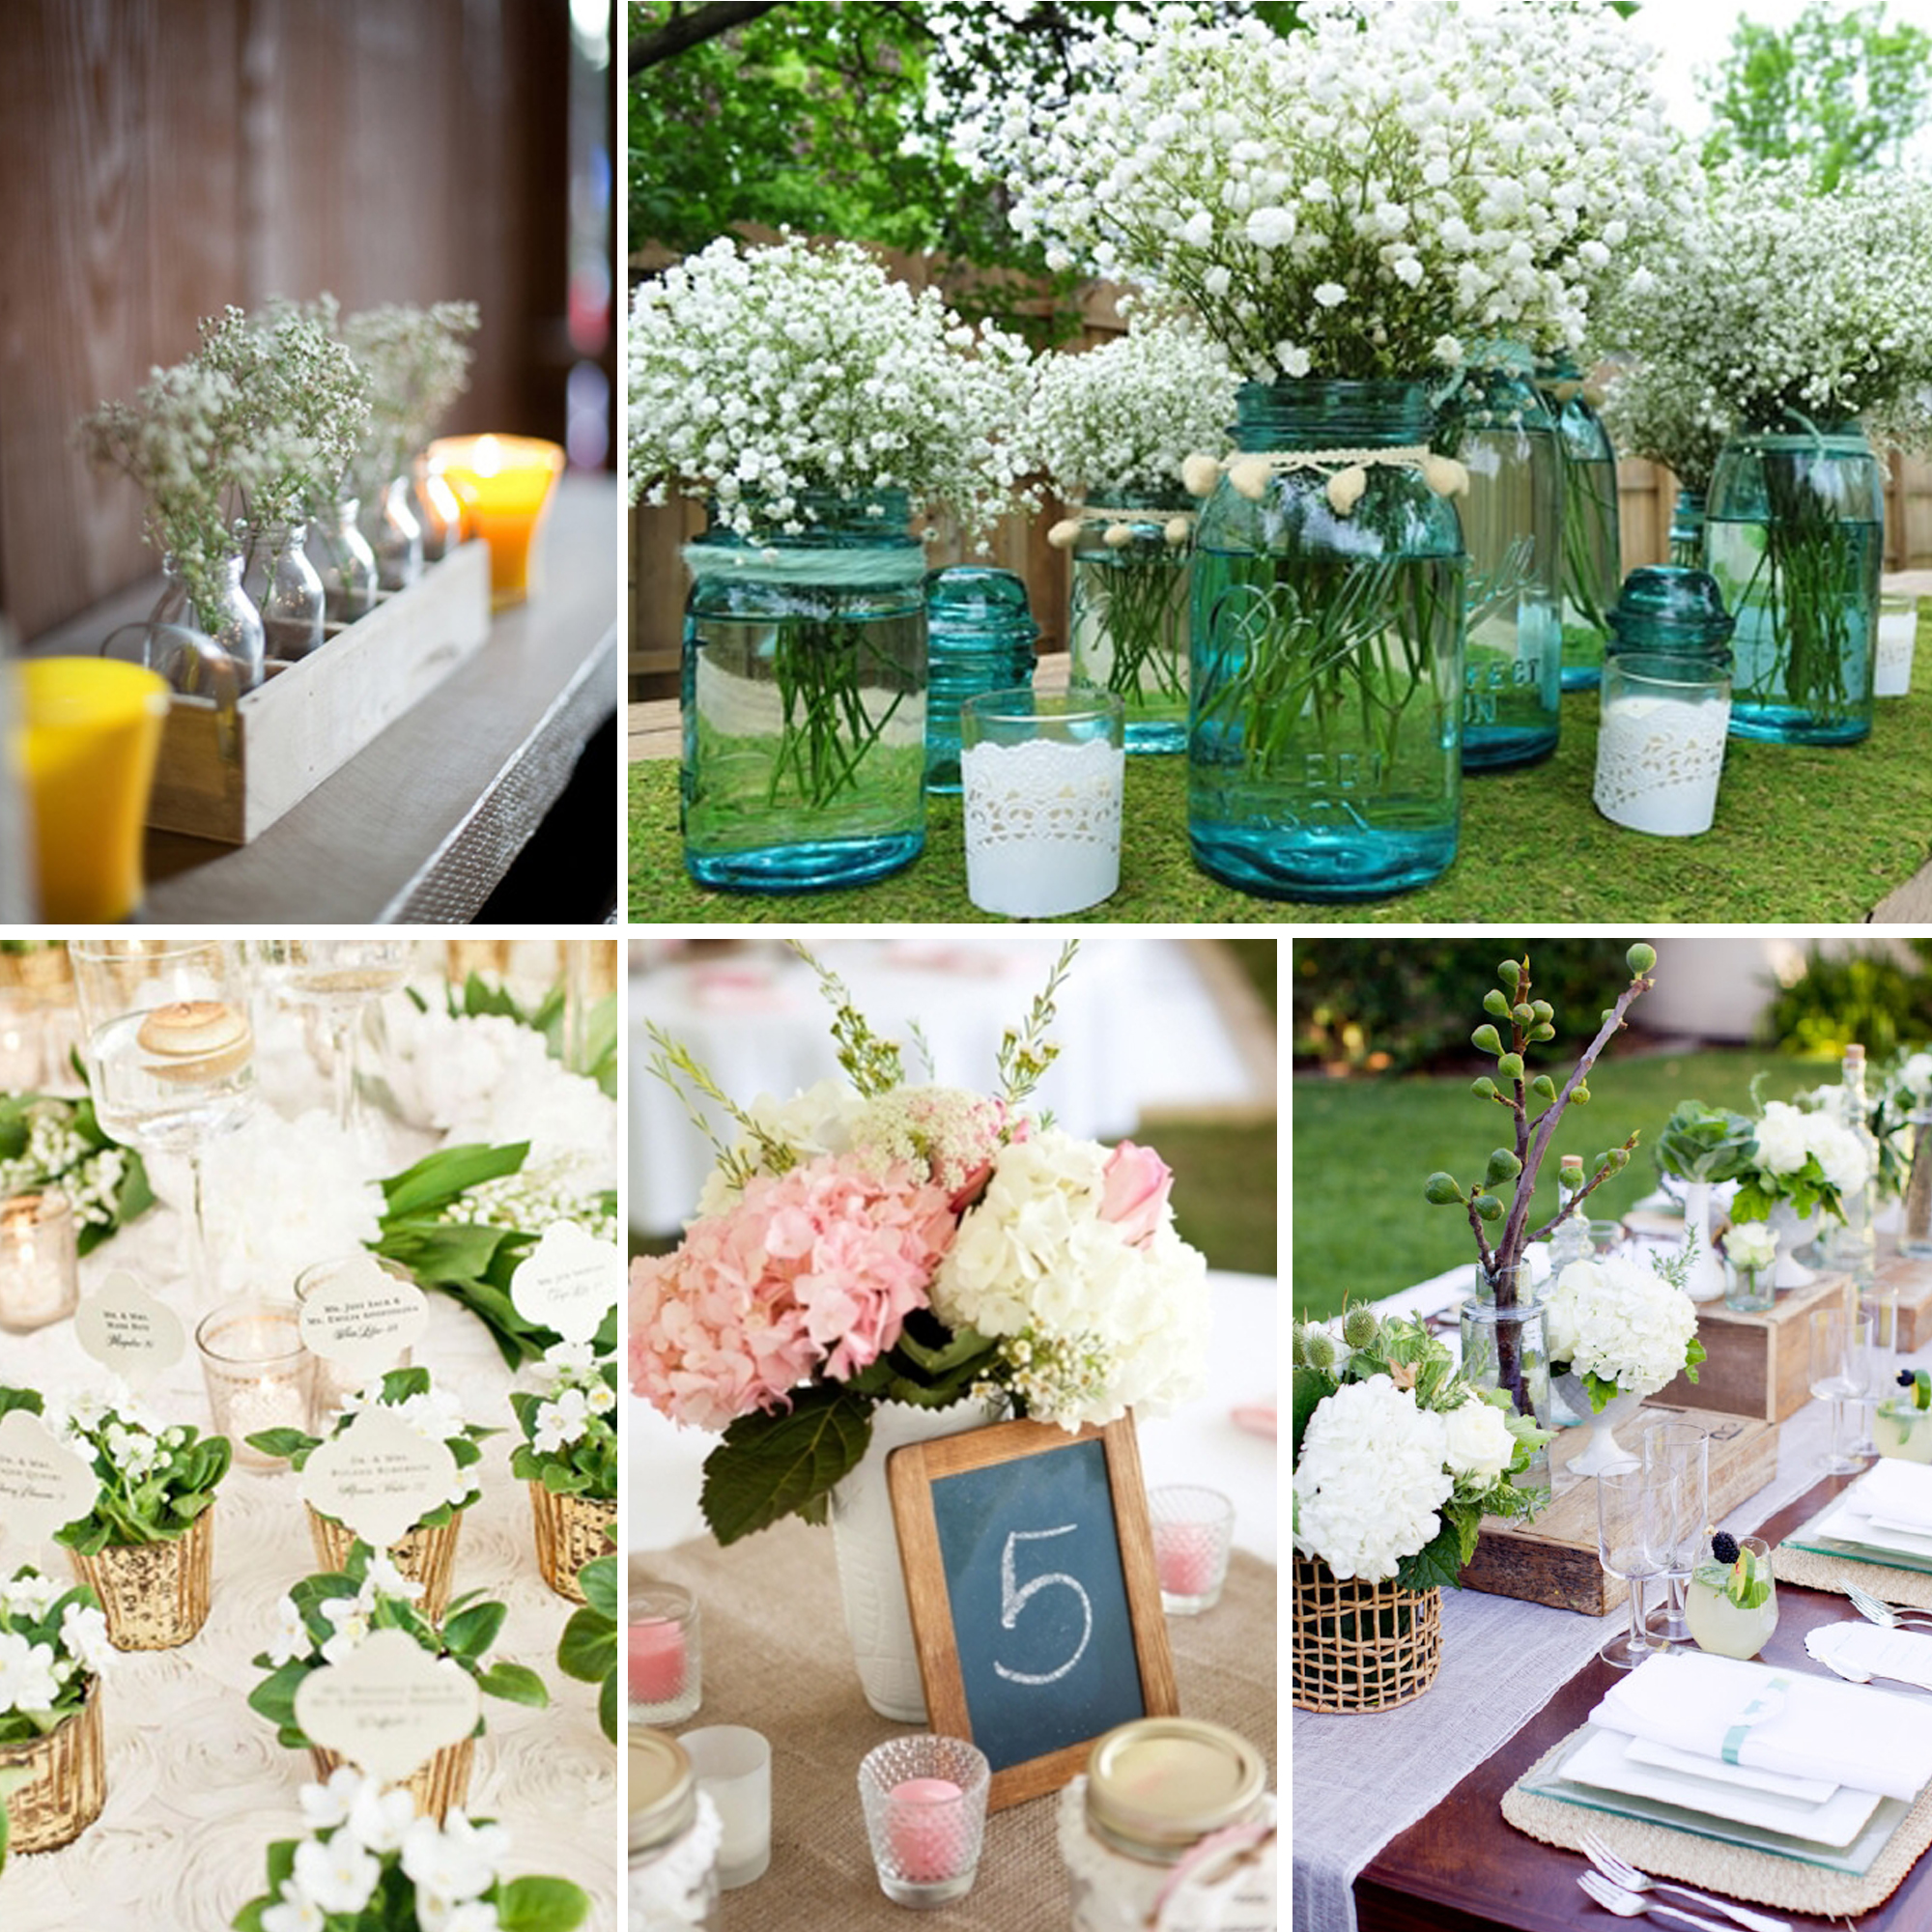 Centros de mesa mon wedding - Decoracion con estilo ...